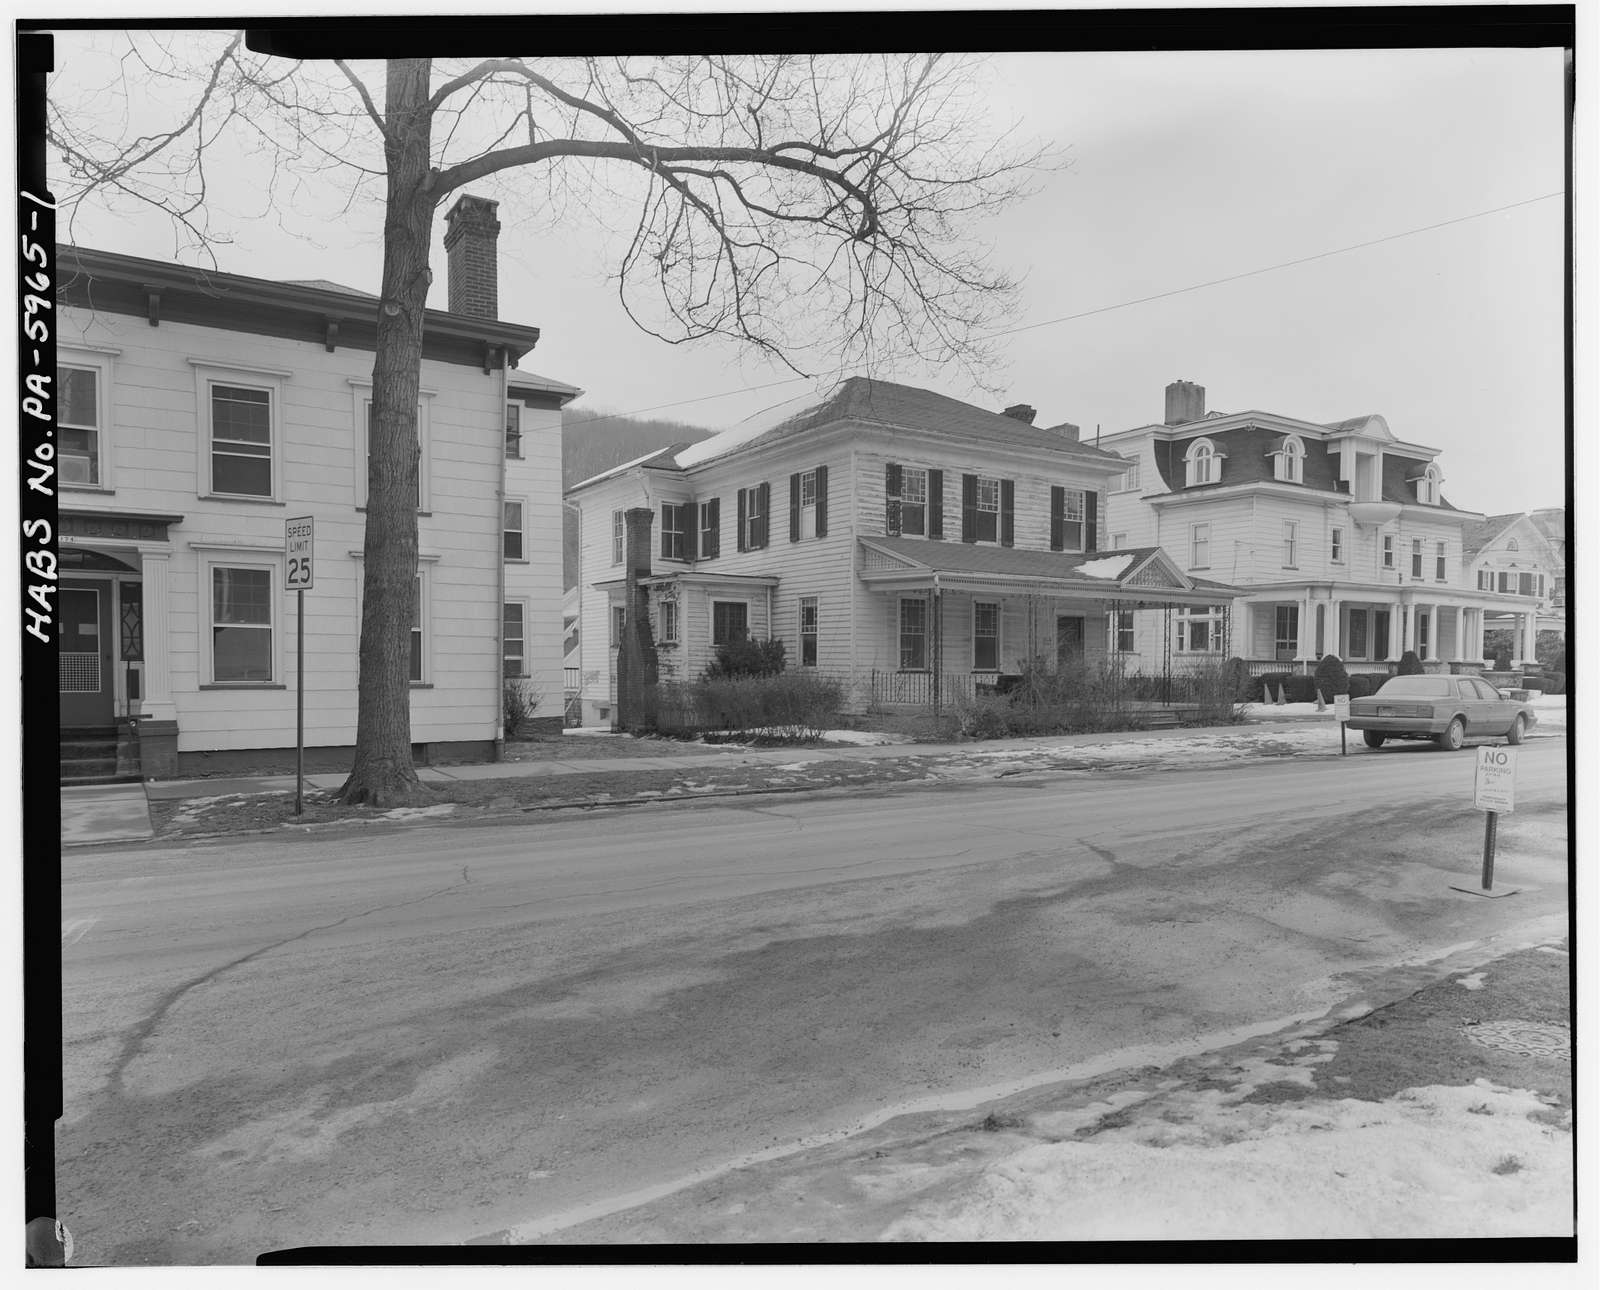 1168-1170 Elk Street (House), Franklin, Venango County, PA